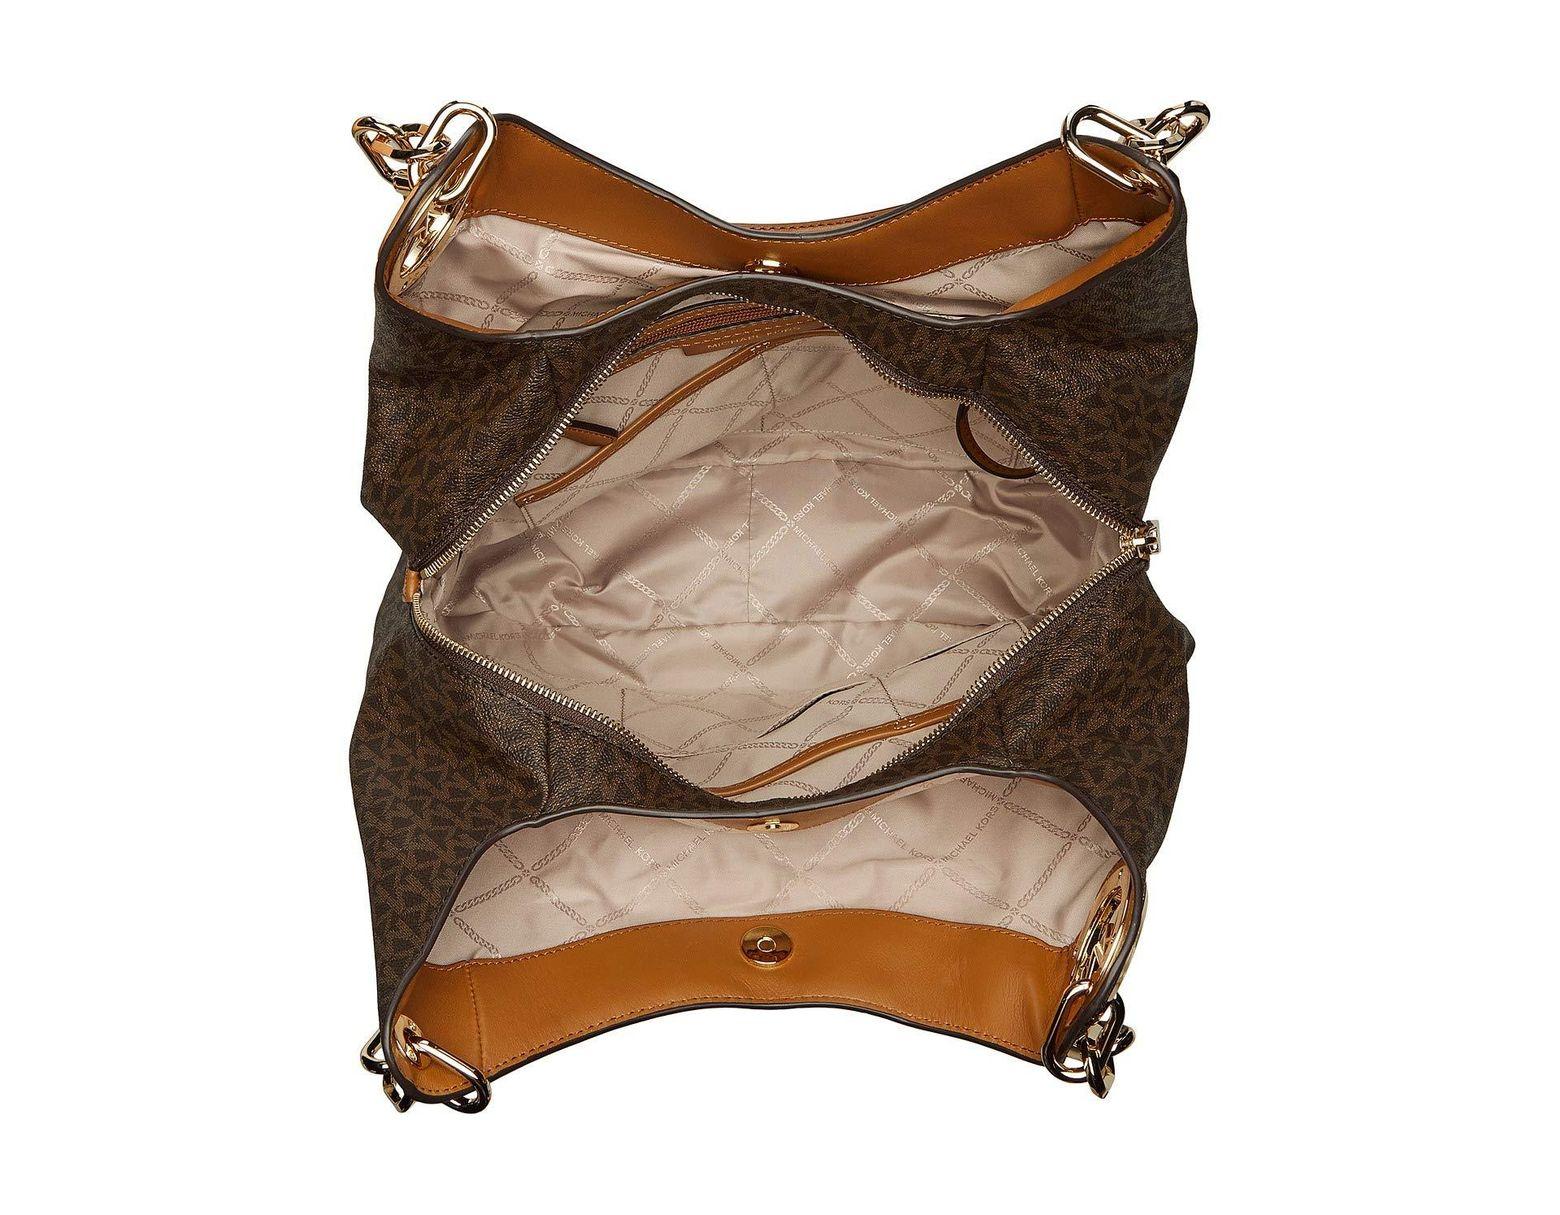 af9534bd165c MICHAEL Michael Kors Lillie Large Chain Shoulder Tote (vanilla/acorn) Tote  Handbags in Brown - Lyst